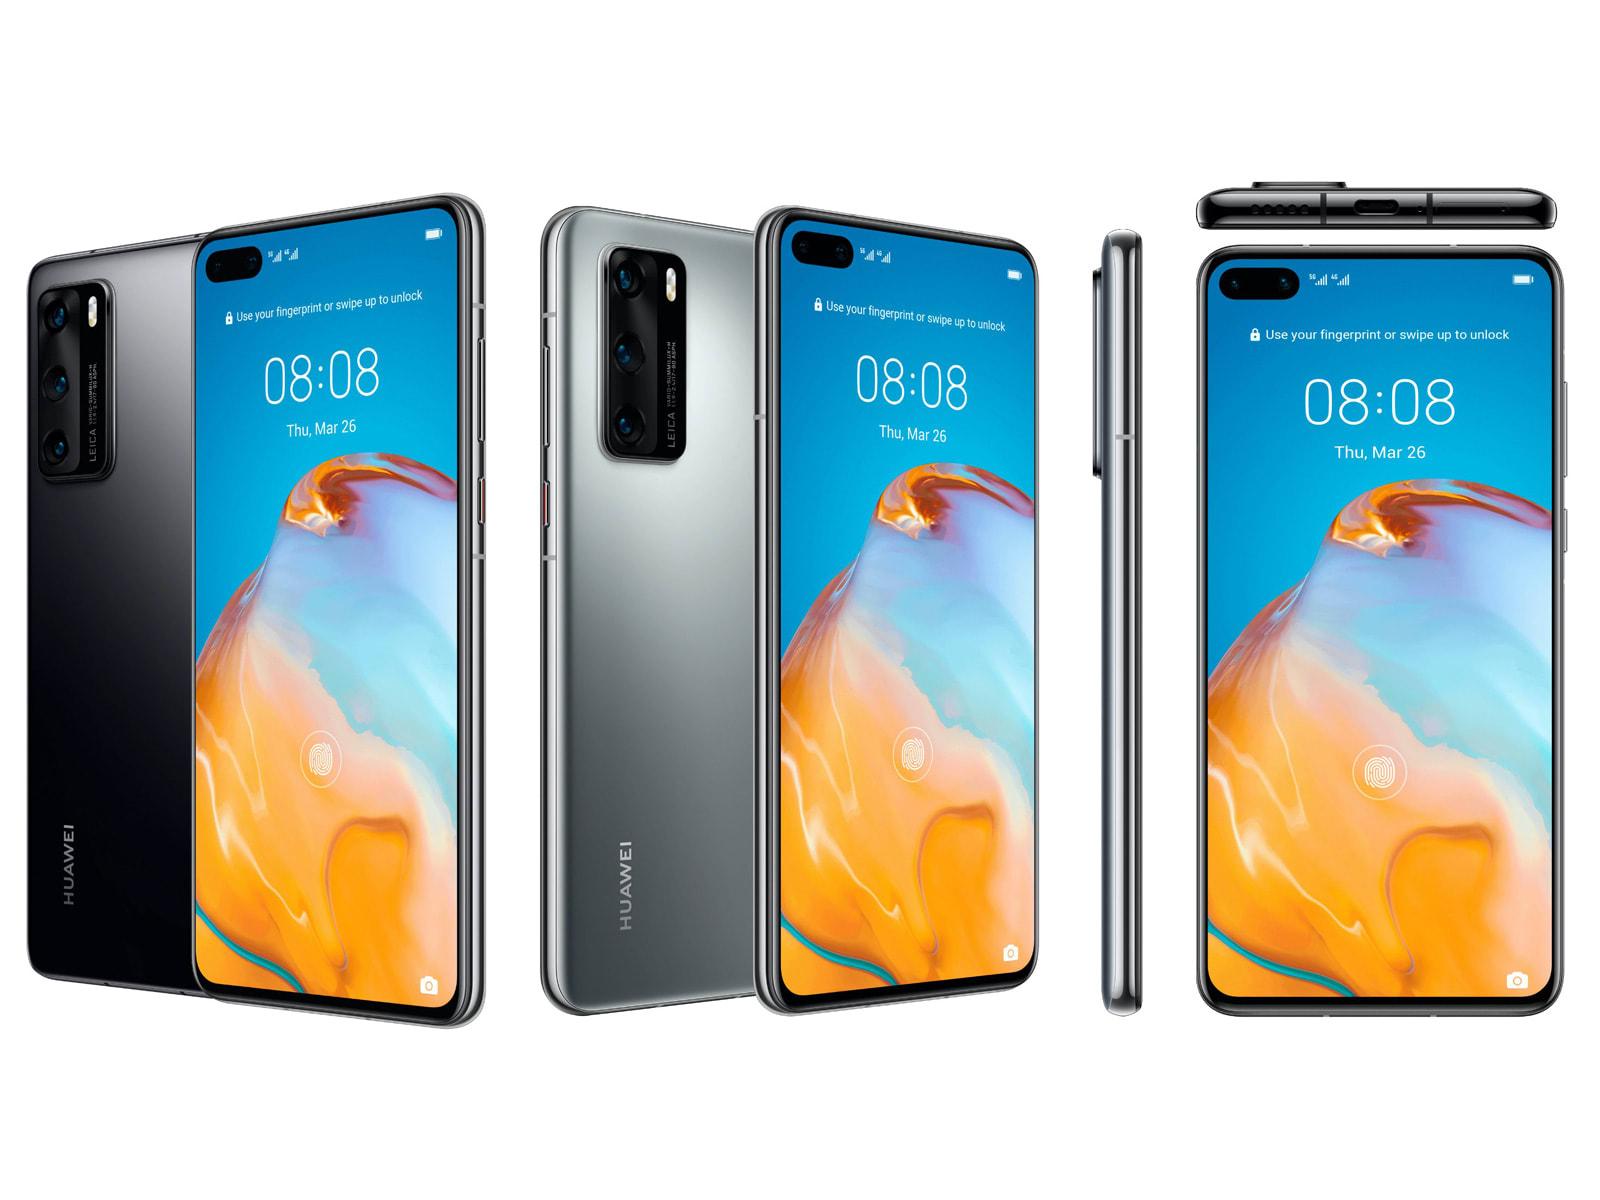 Huawei P40 huawei p40 pro may feature 50x zoom, custom photography chip - e1bc0d80 6c76 11ea b77f 72fa4bb8ef3f client a1acac3e1b3290917d92 signature ba7a26be9d108600a8fe244b179437104a3392c3 - Huawei P40 Pro may feature 50X zoom, custom photography chip huawei p40 pro may feature 50x zoom, custom photography chip - e1bc0d80 6c76 11ea b77f 72fa4bb8ef3f client a1acac3e1b3290917d92 signature ba7a26be9d108600a8fe244b179437104a3392c3 - Huawei P40 Pro may feature 50X zoom, custom photography chip